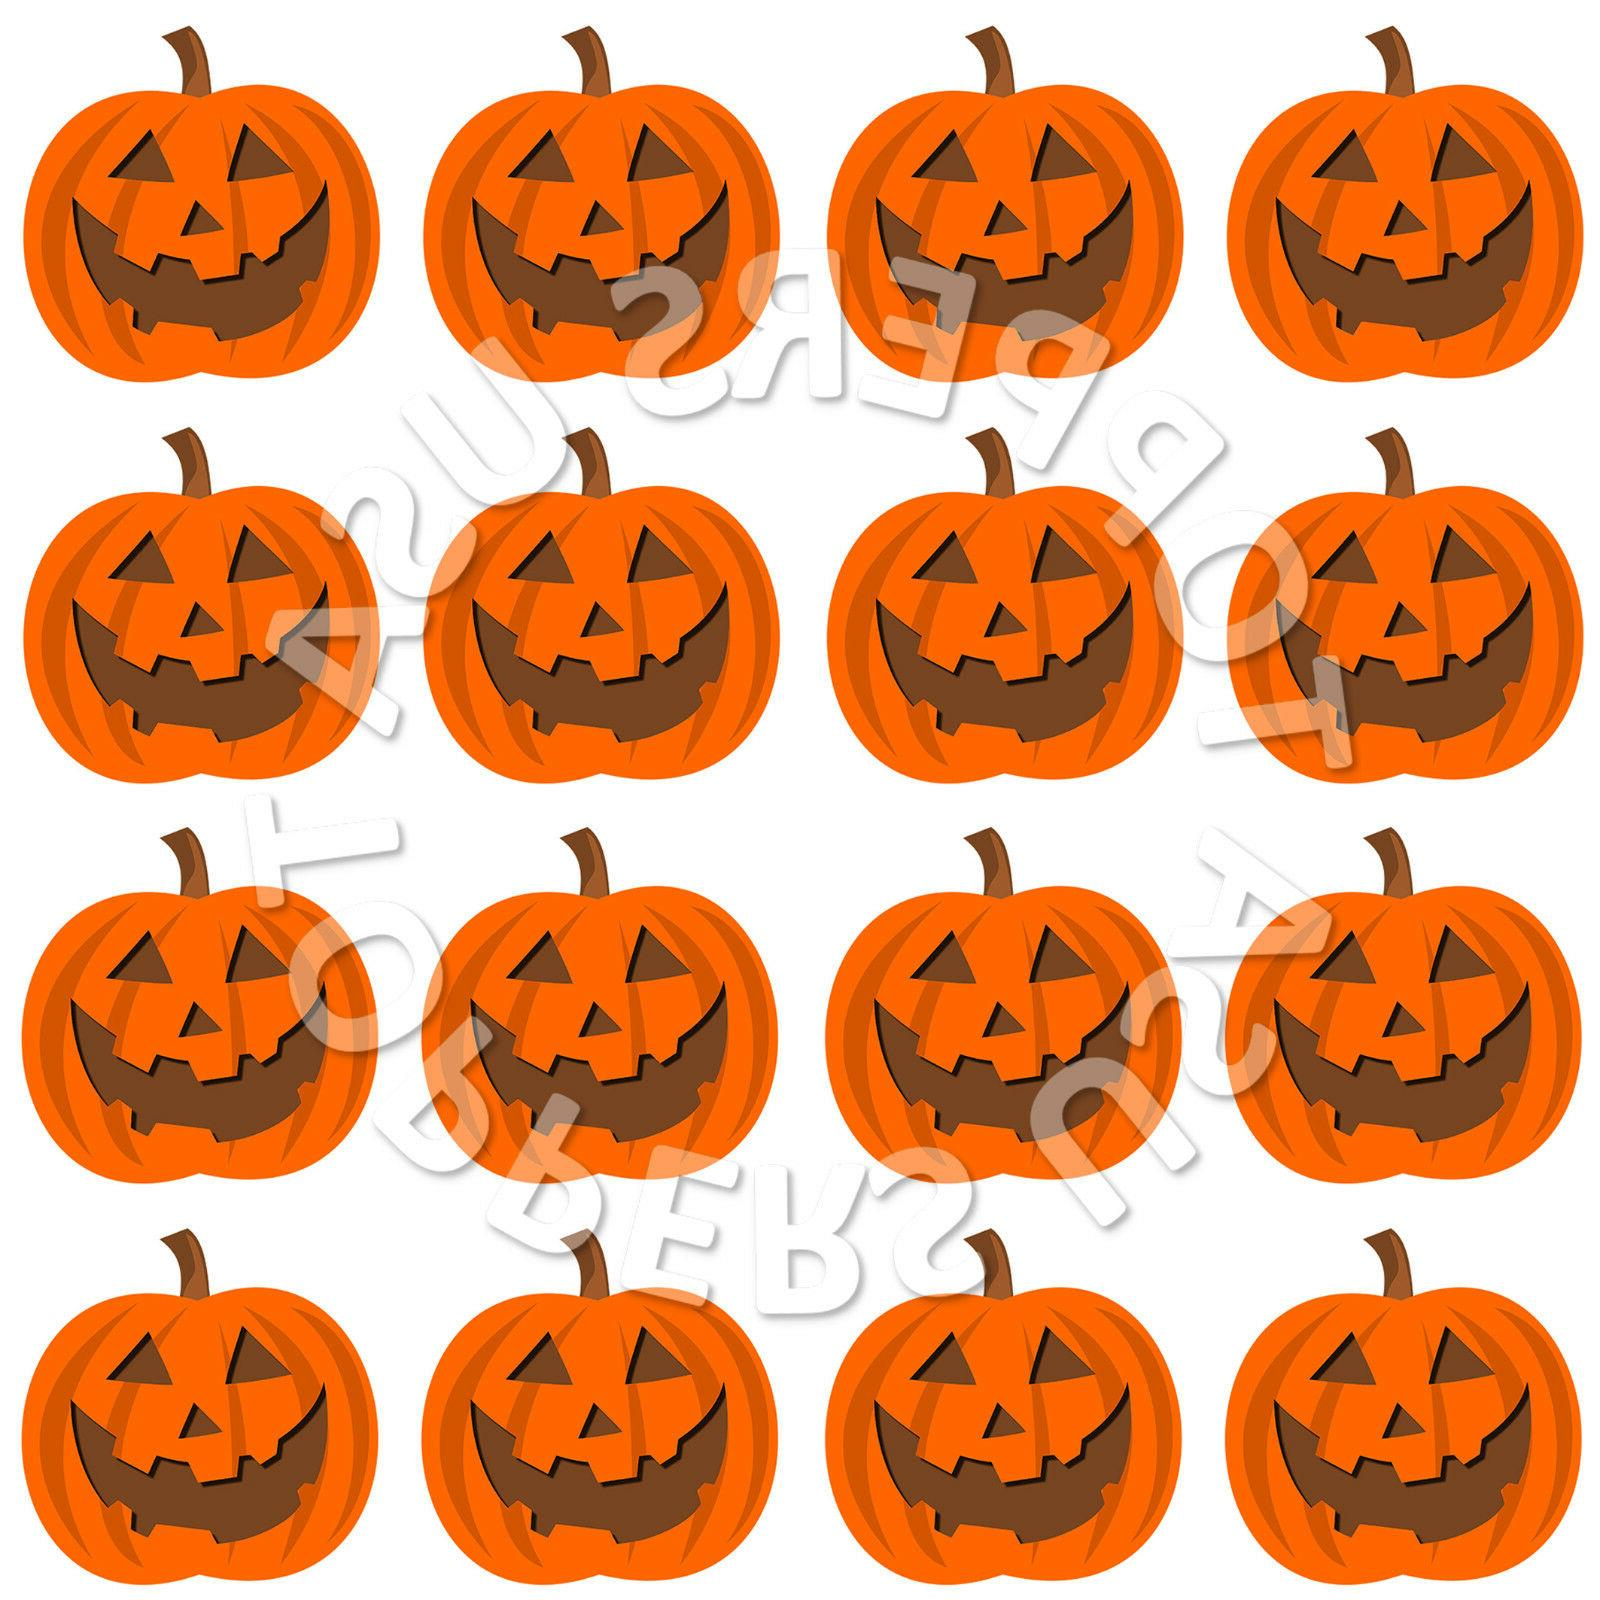 16x edible halloween pumpkin face cupcake toppers